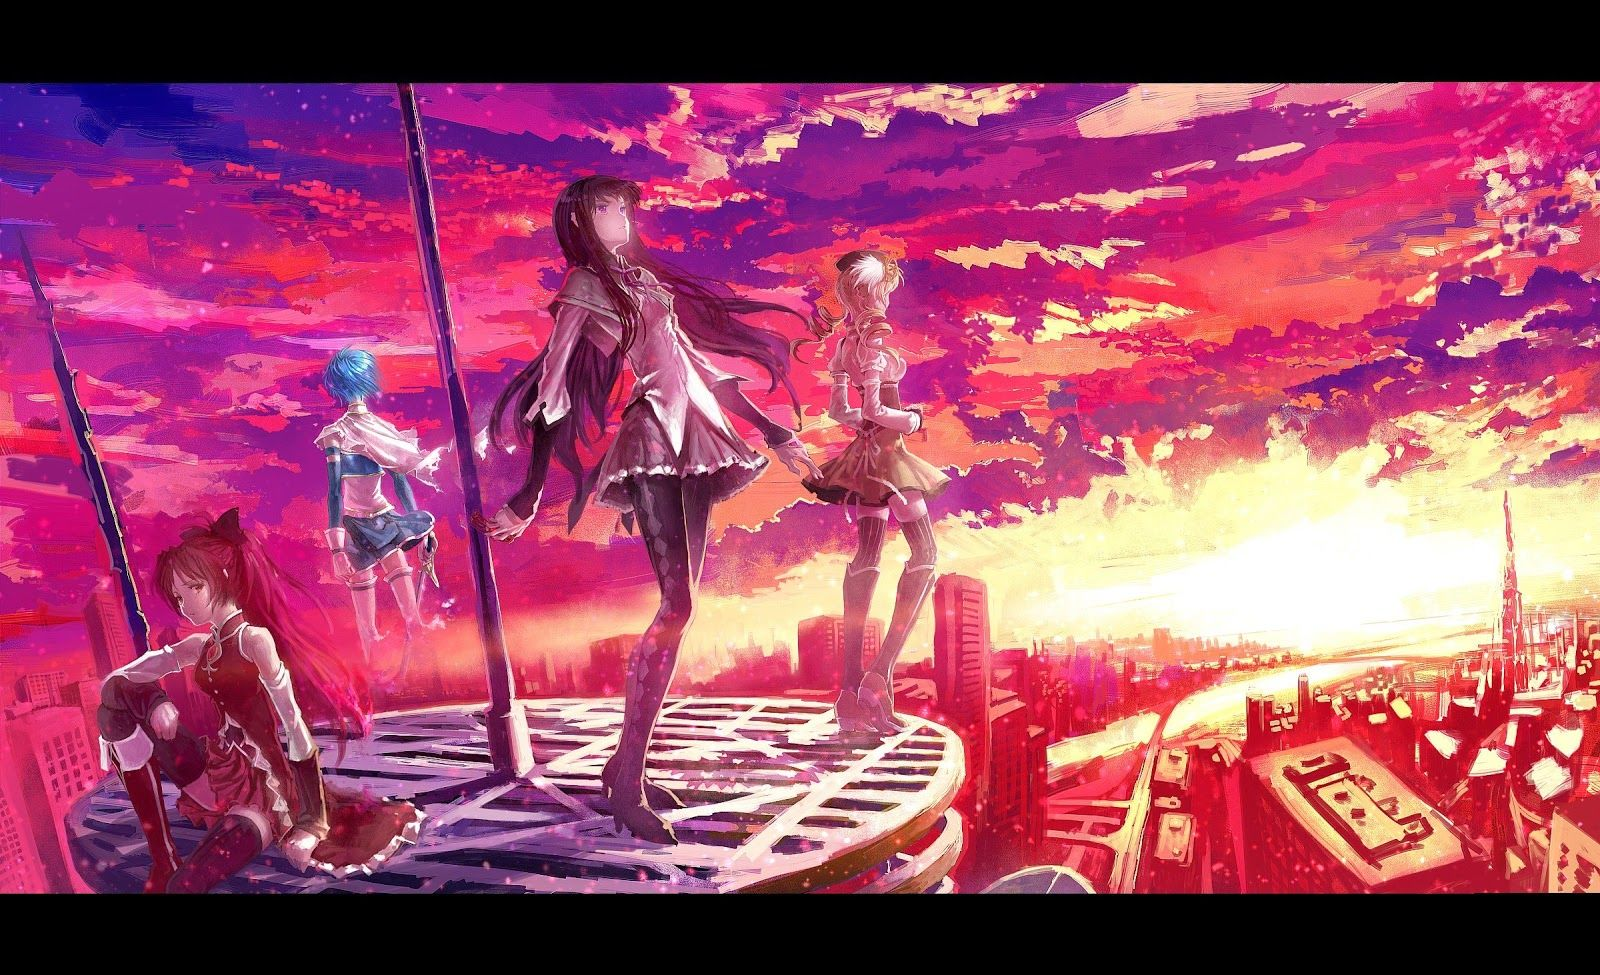 Anime ภาพพ นหล ง Anime การ ต น สวยๆ Anime Wallpaper Live การ ต น อะน เมะ ภาพพ นหล ง